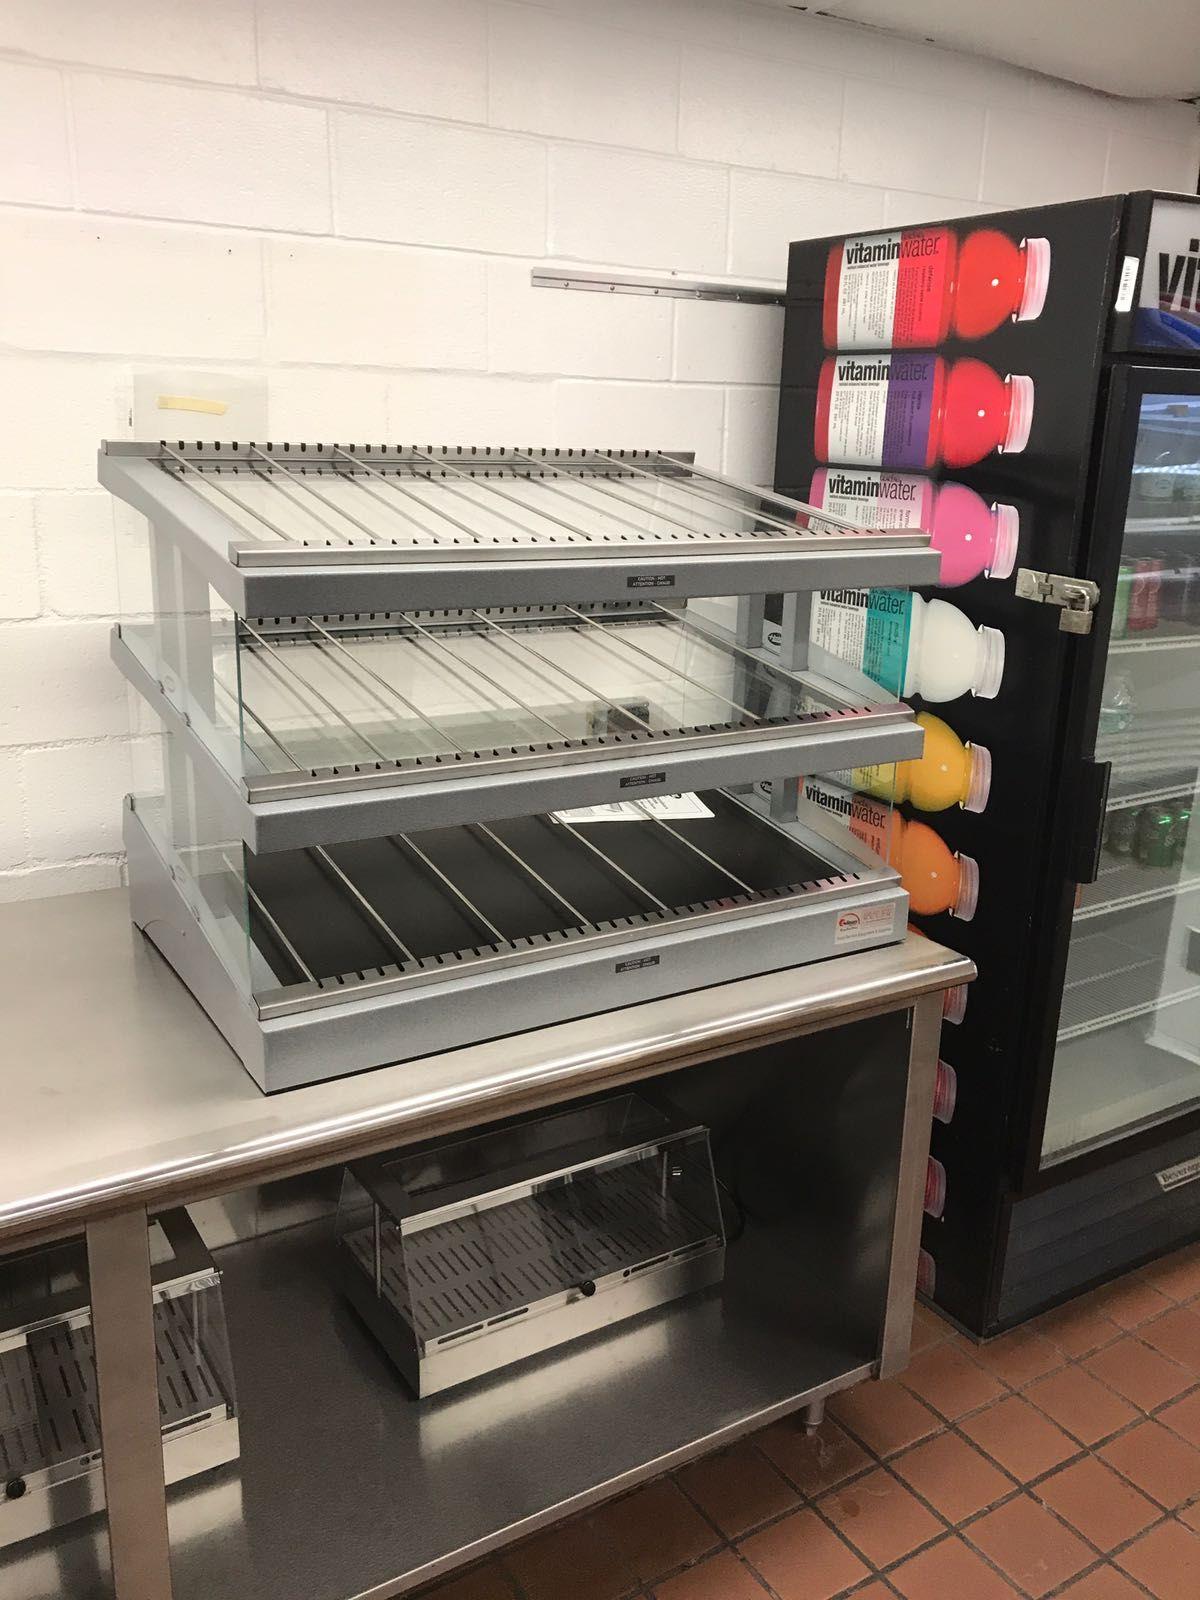 10 Ways to Immediately Start Selling Kitchen Equipment for